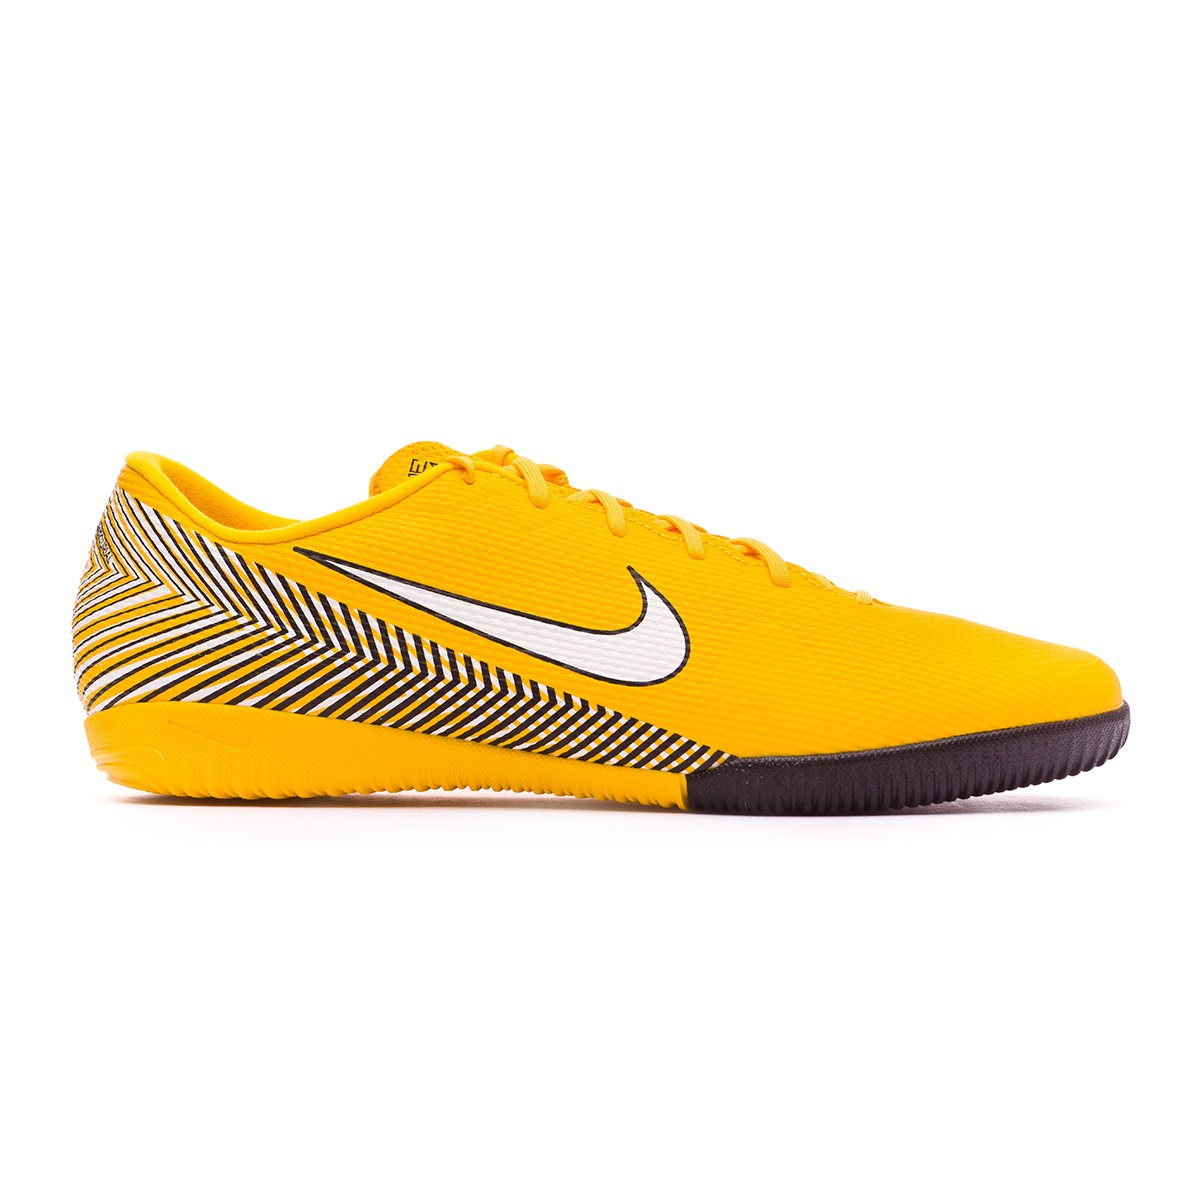 f9f8968d993 Futsal Boot Nike Mercurial VaporX XII Academy IC Neymar Yellow-Black -  Football store Fútbol Emotion